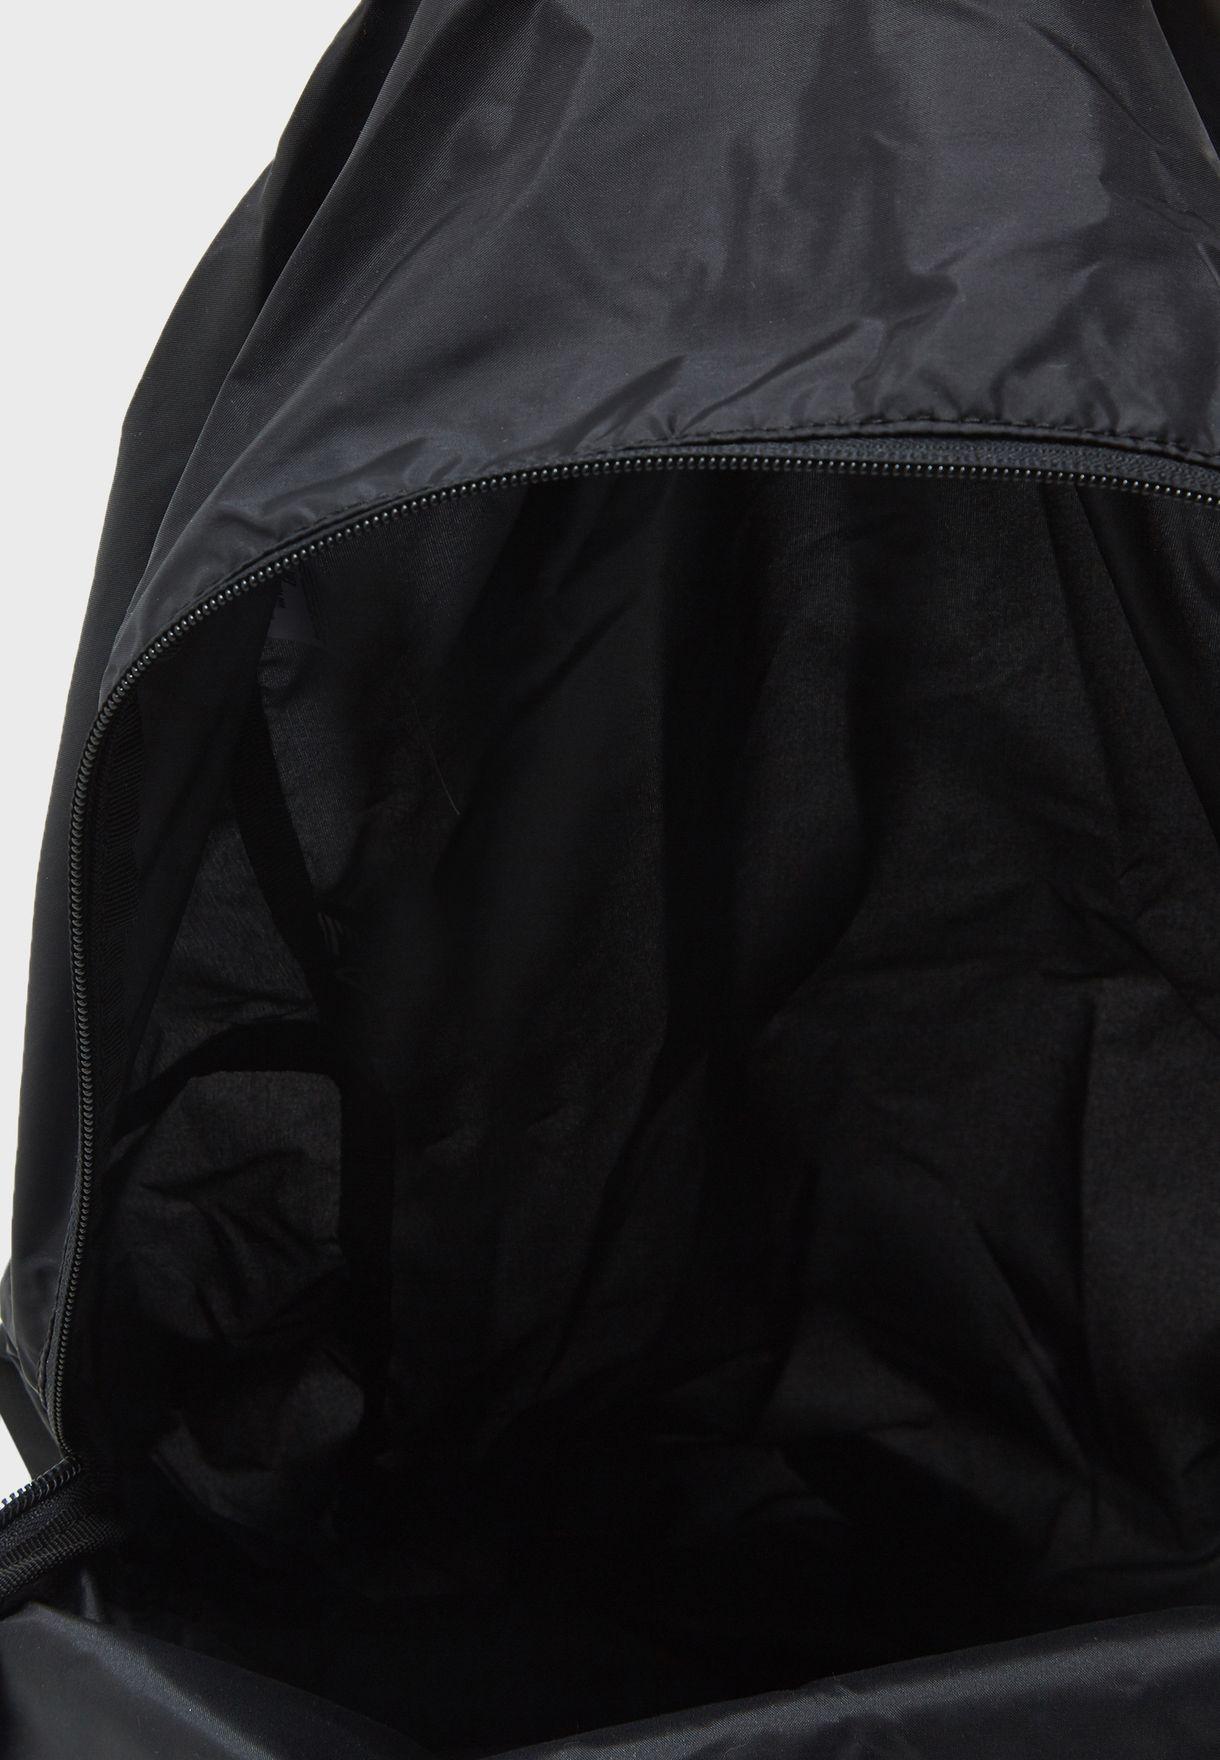 5ad1747b17f5 Shop Ea7 Emporio Armani black Train Foldable Backpack CC801-245002 ...